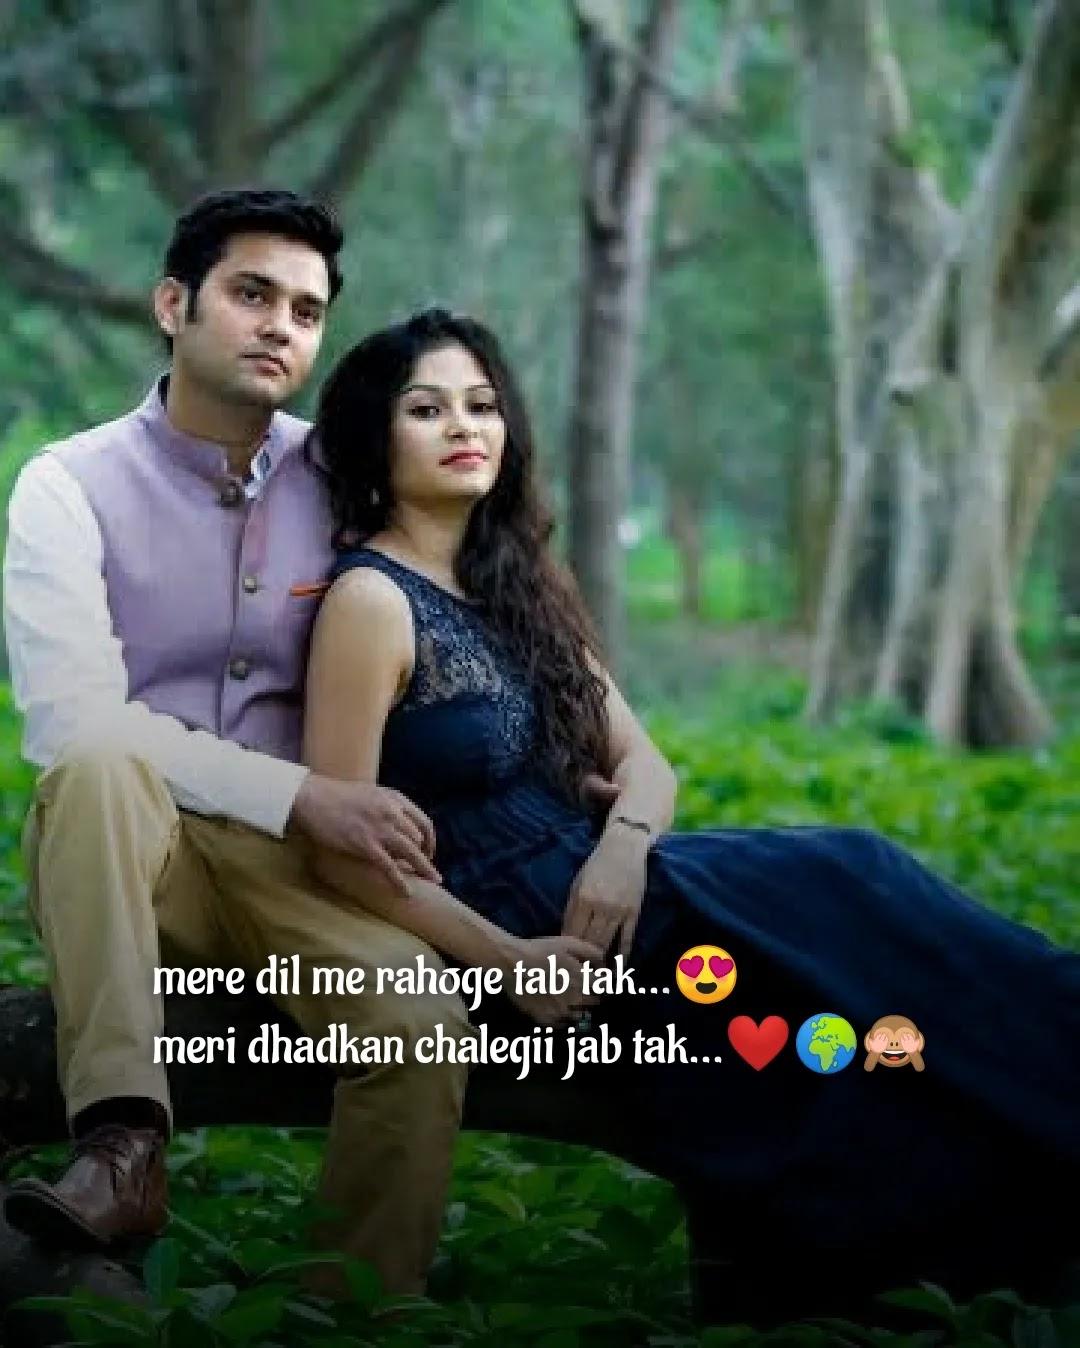 Romantic Shayari in Hindi | रोमांटिक शायरी हिंदी